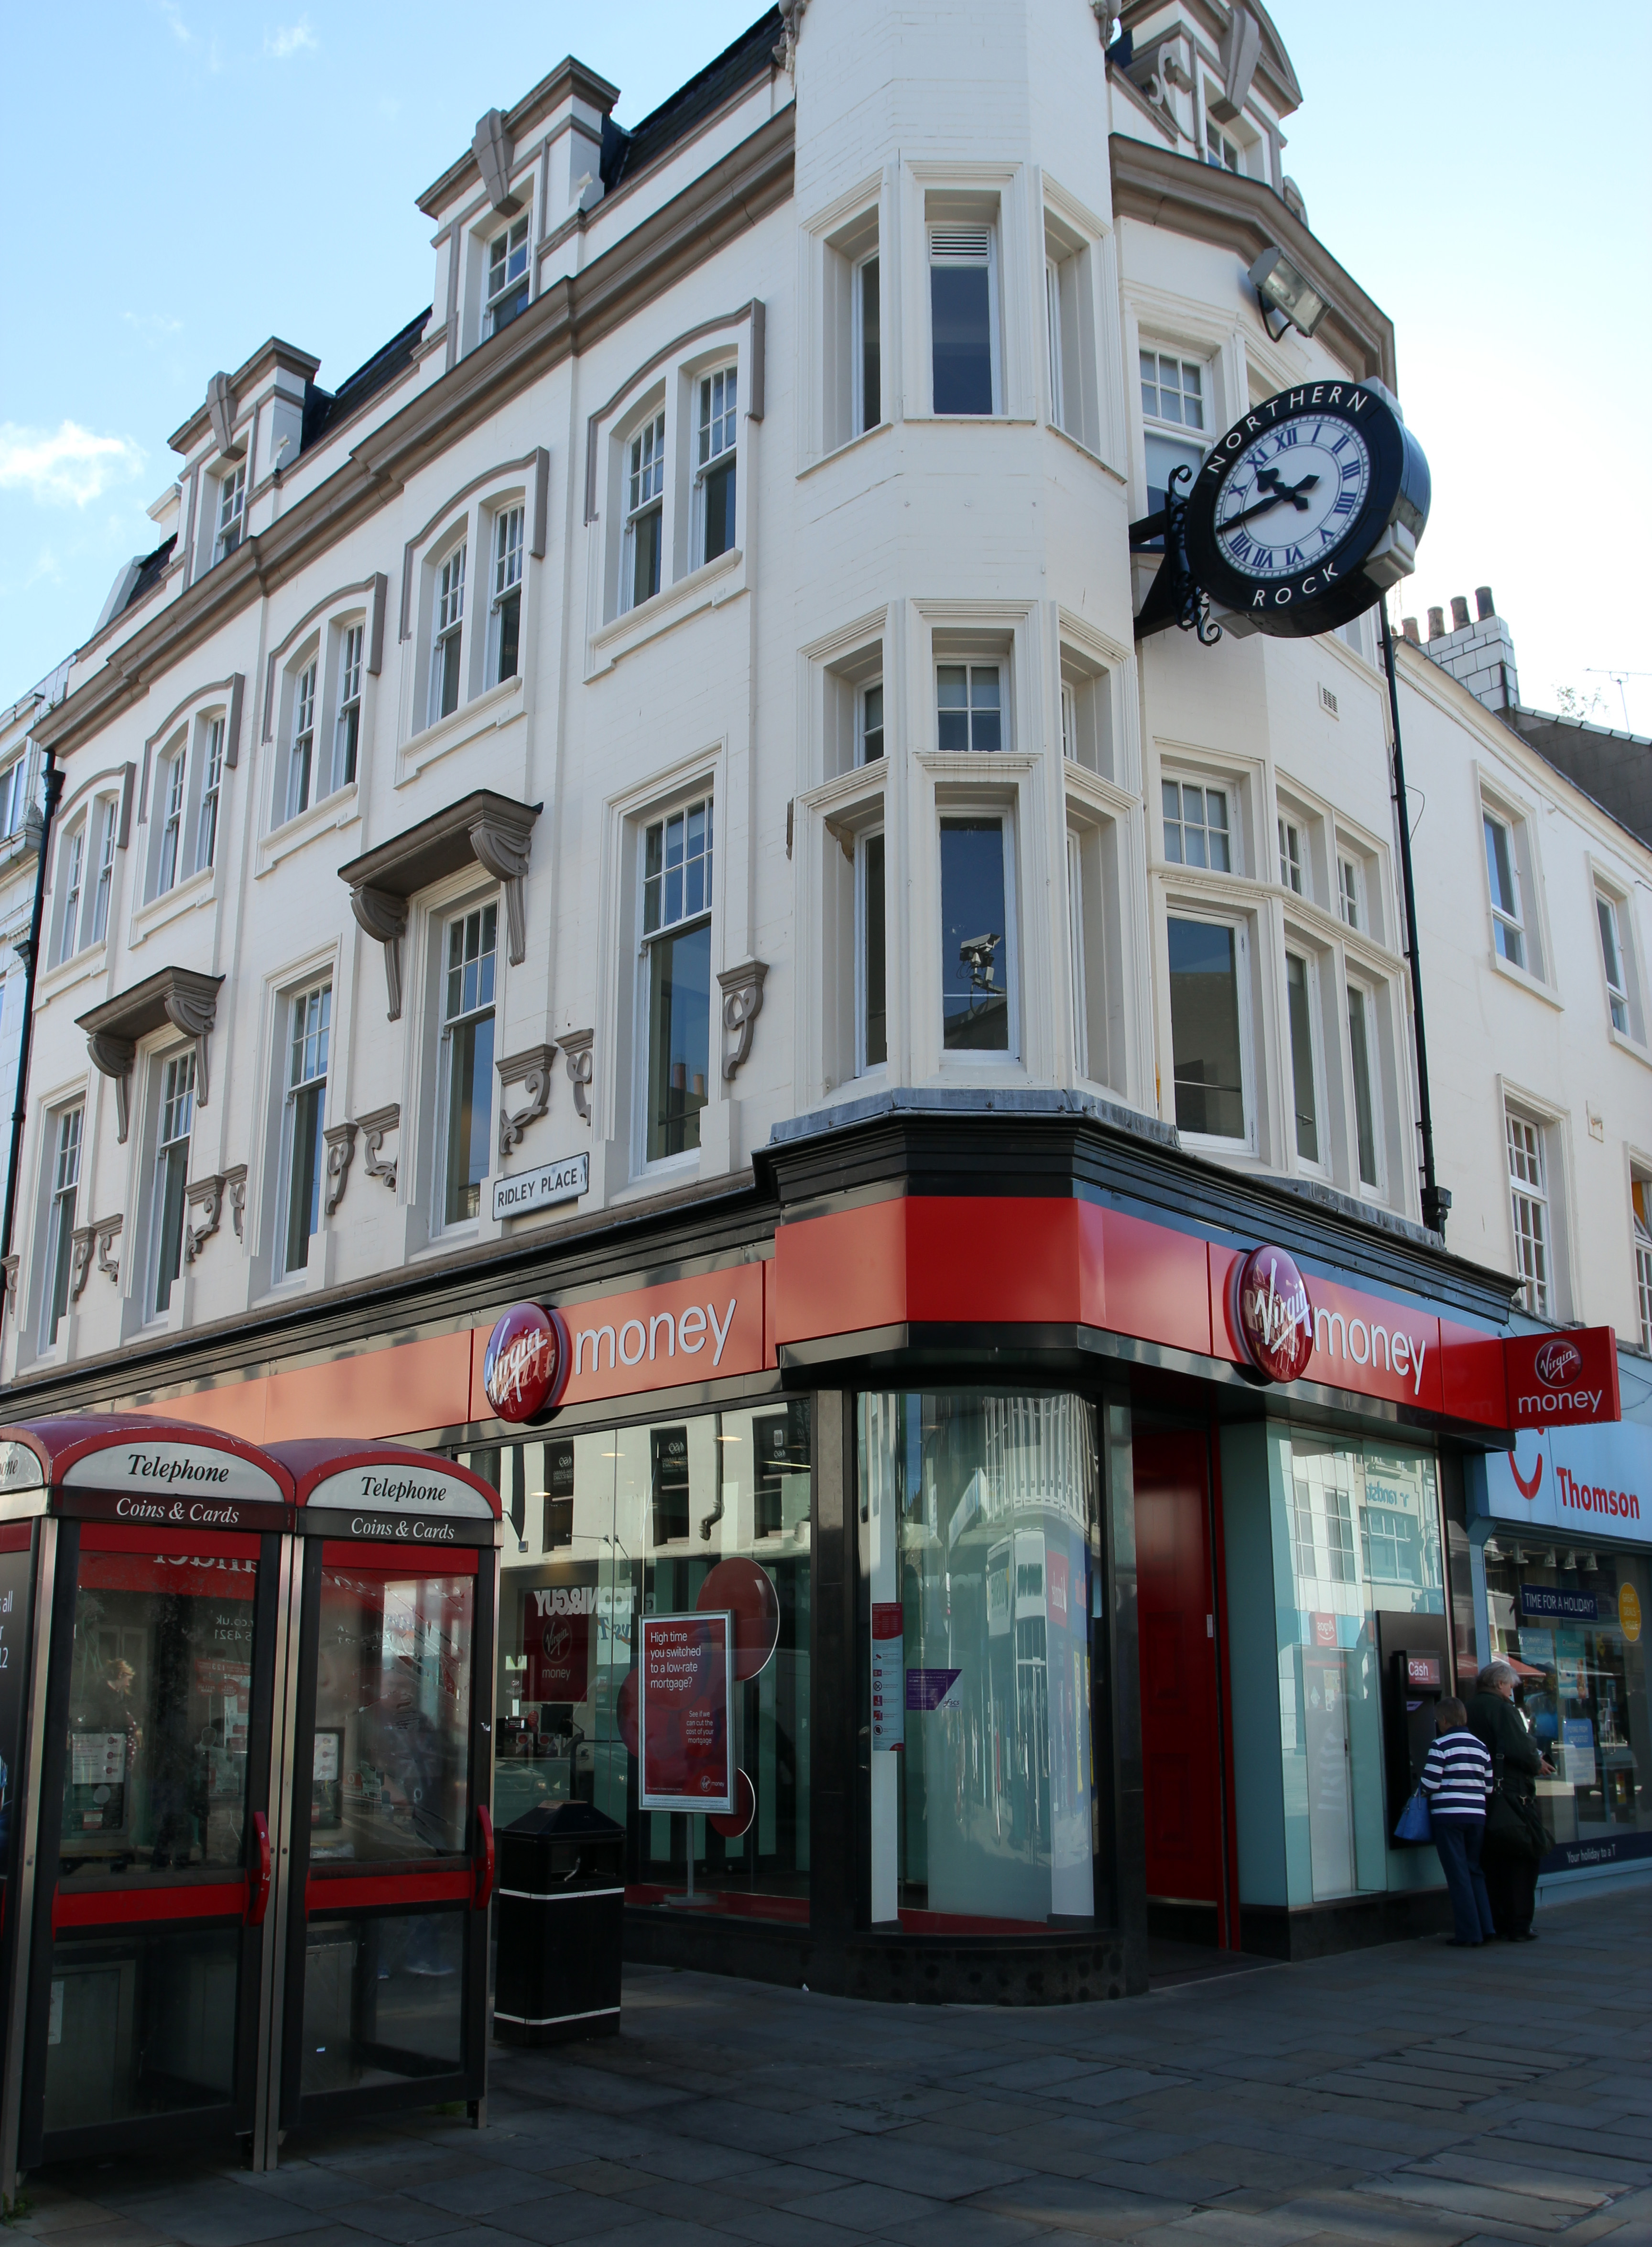 Virgin Phone Shop In Newcastle 110